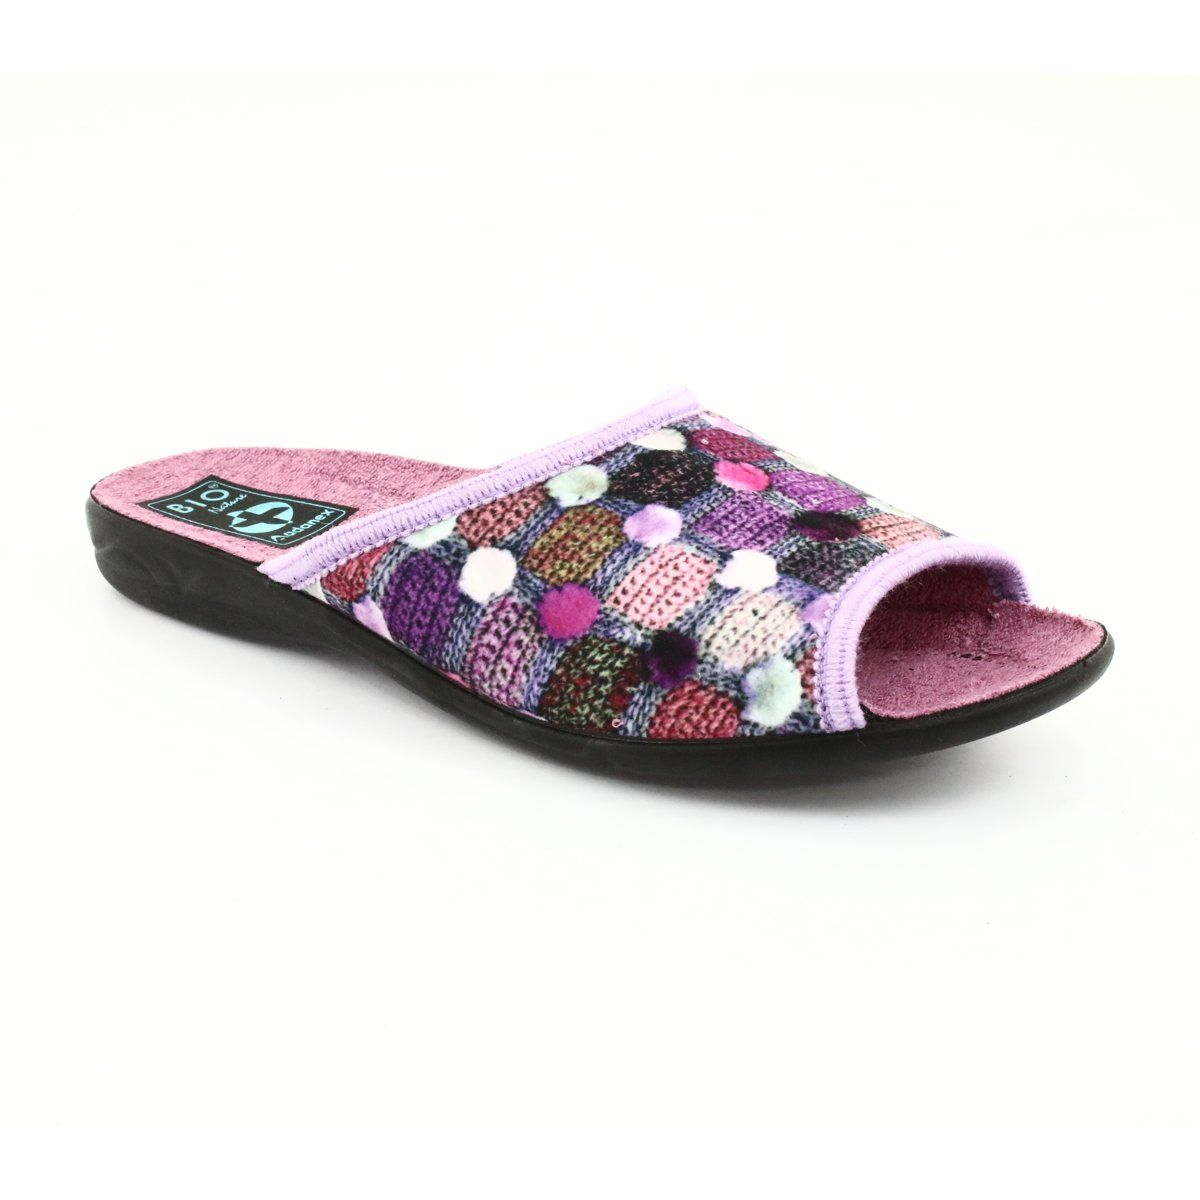 Homemade Women S Adanex 3d Adanex Flip Flops Slippers Purple Flip Flop Slippers Cute Slippers Slippers